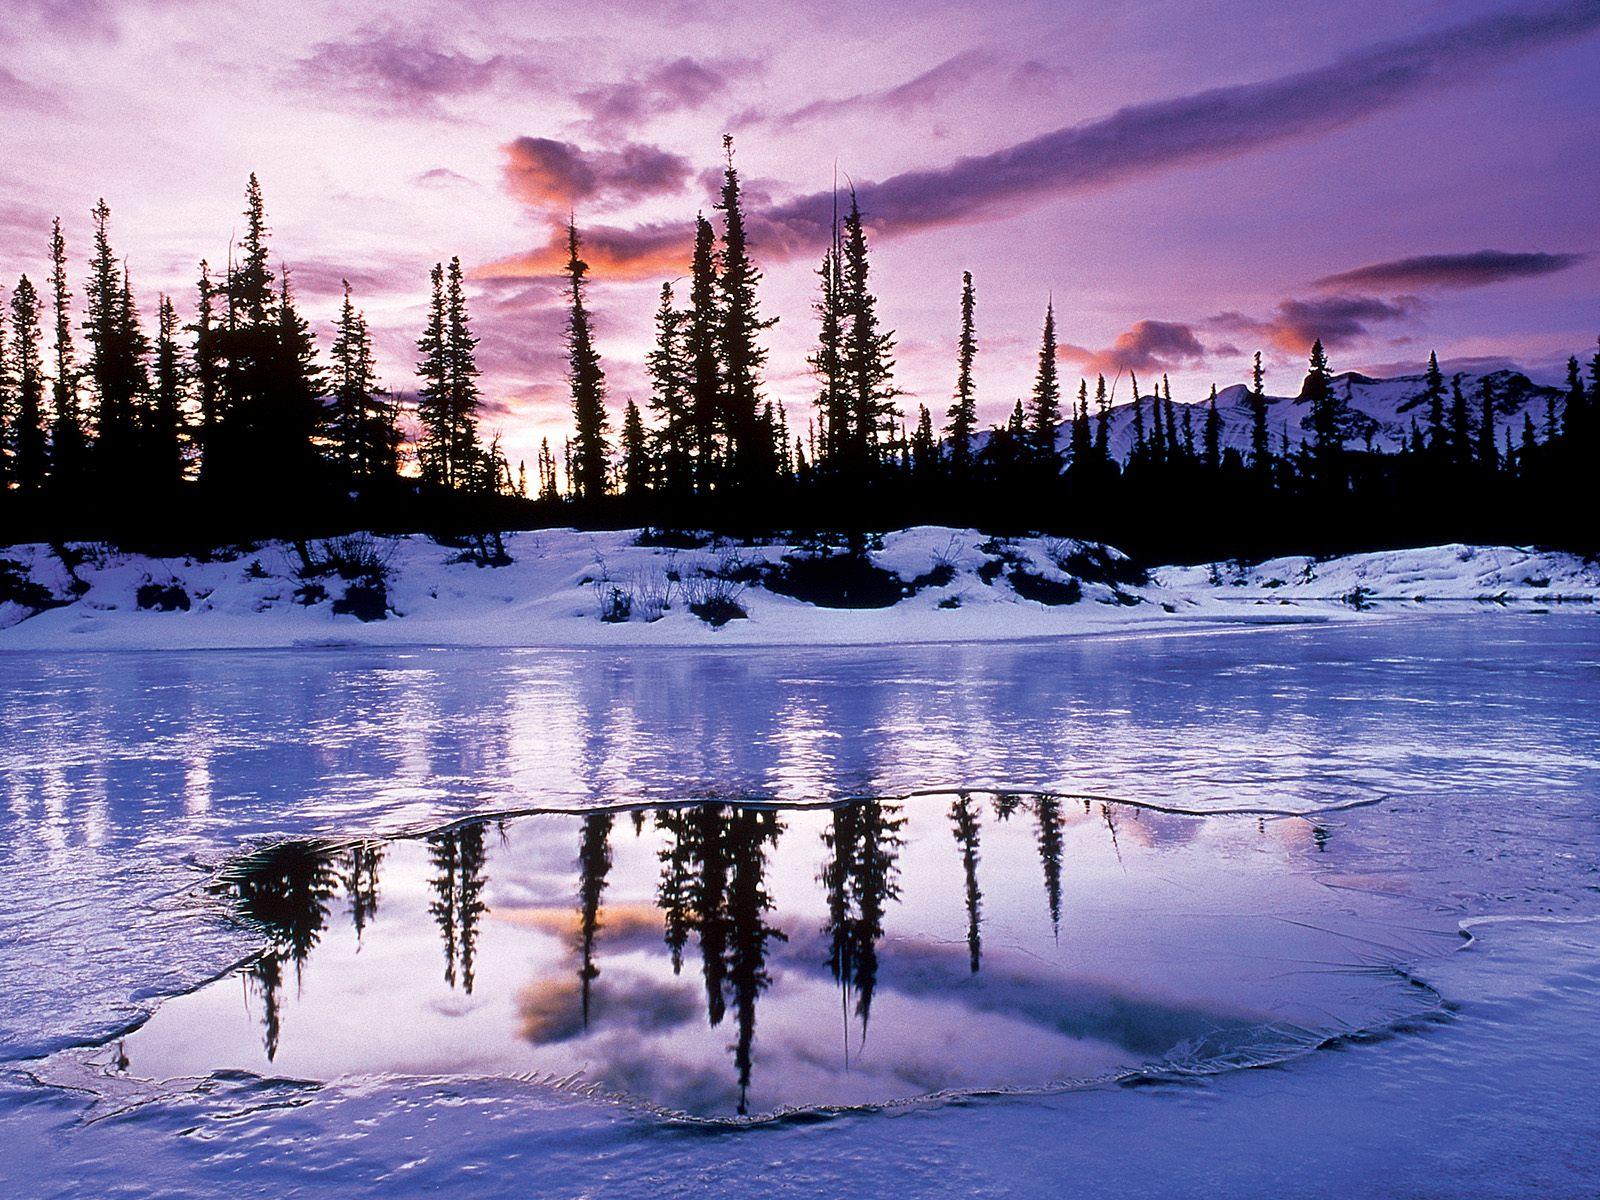 FULL WALLPAPER: Winter Wallpapers